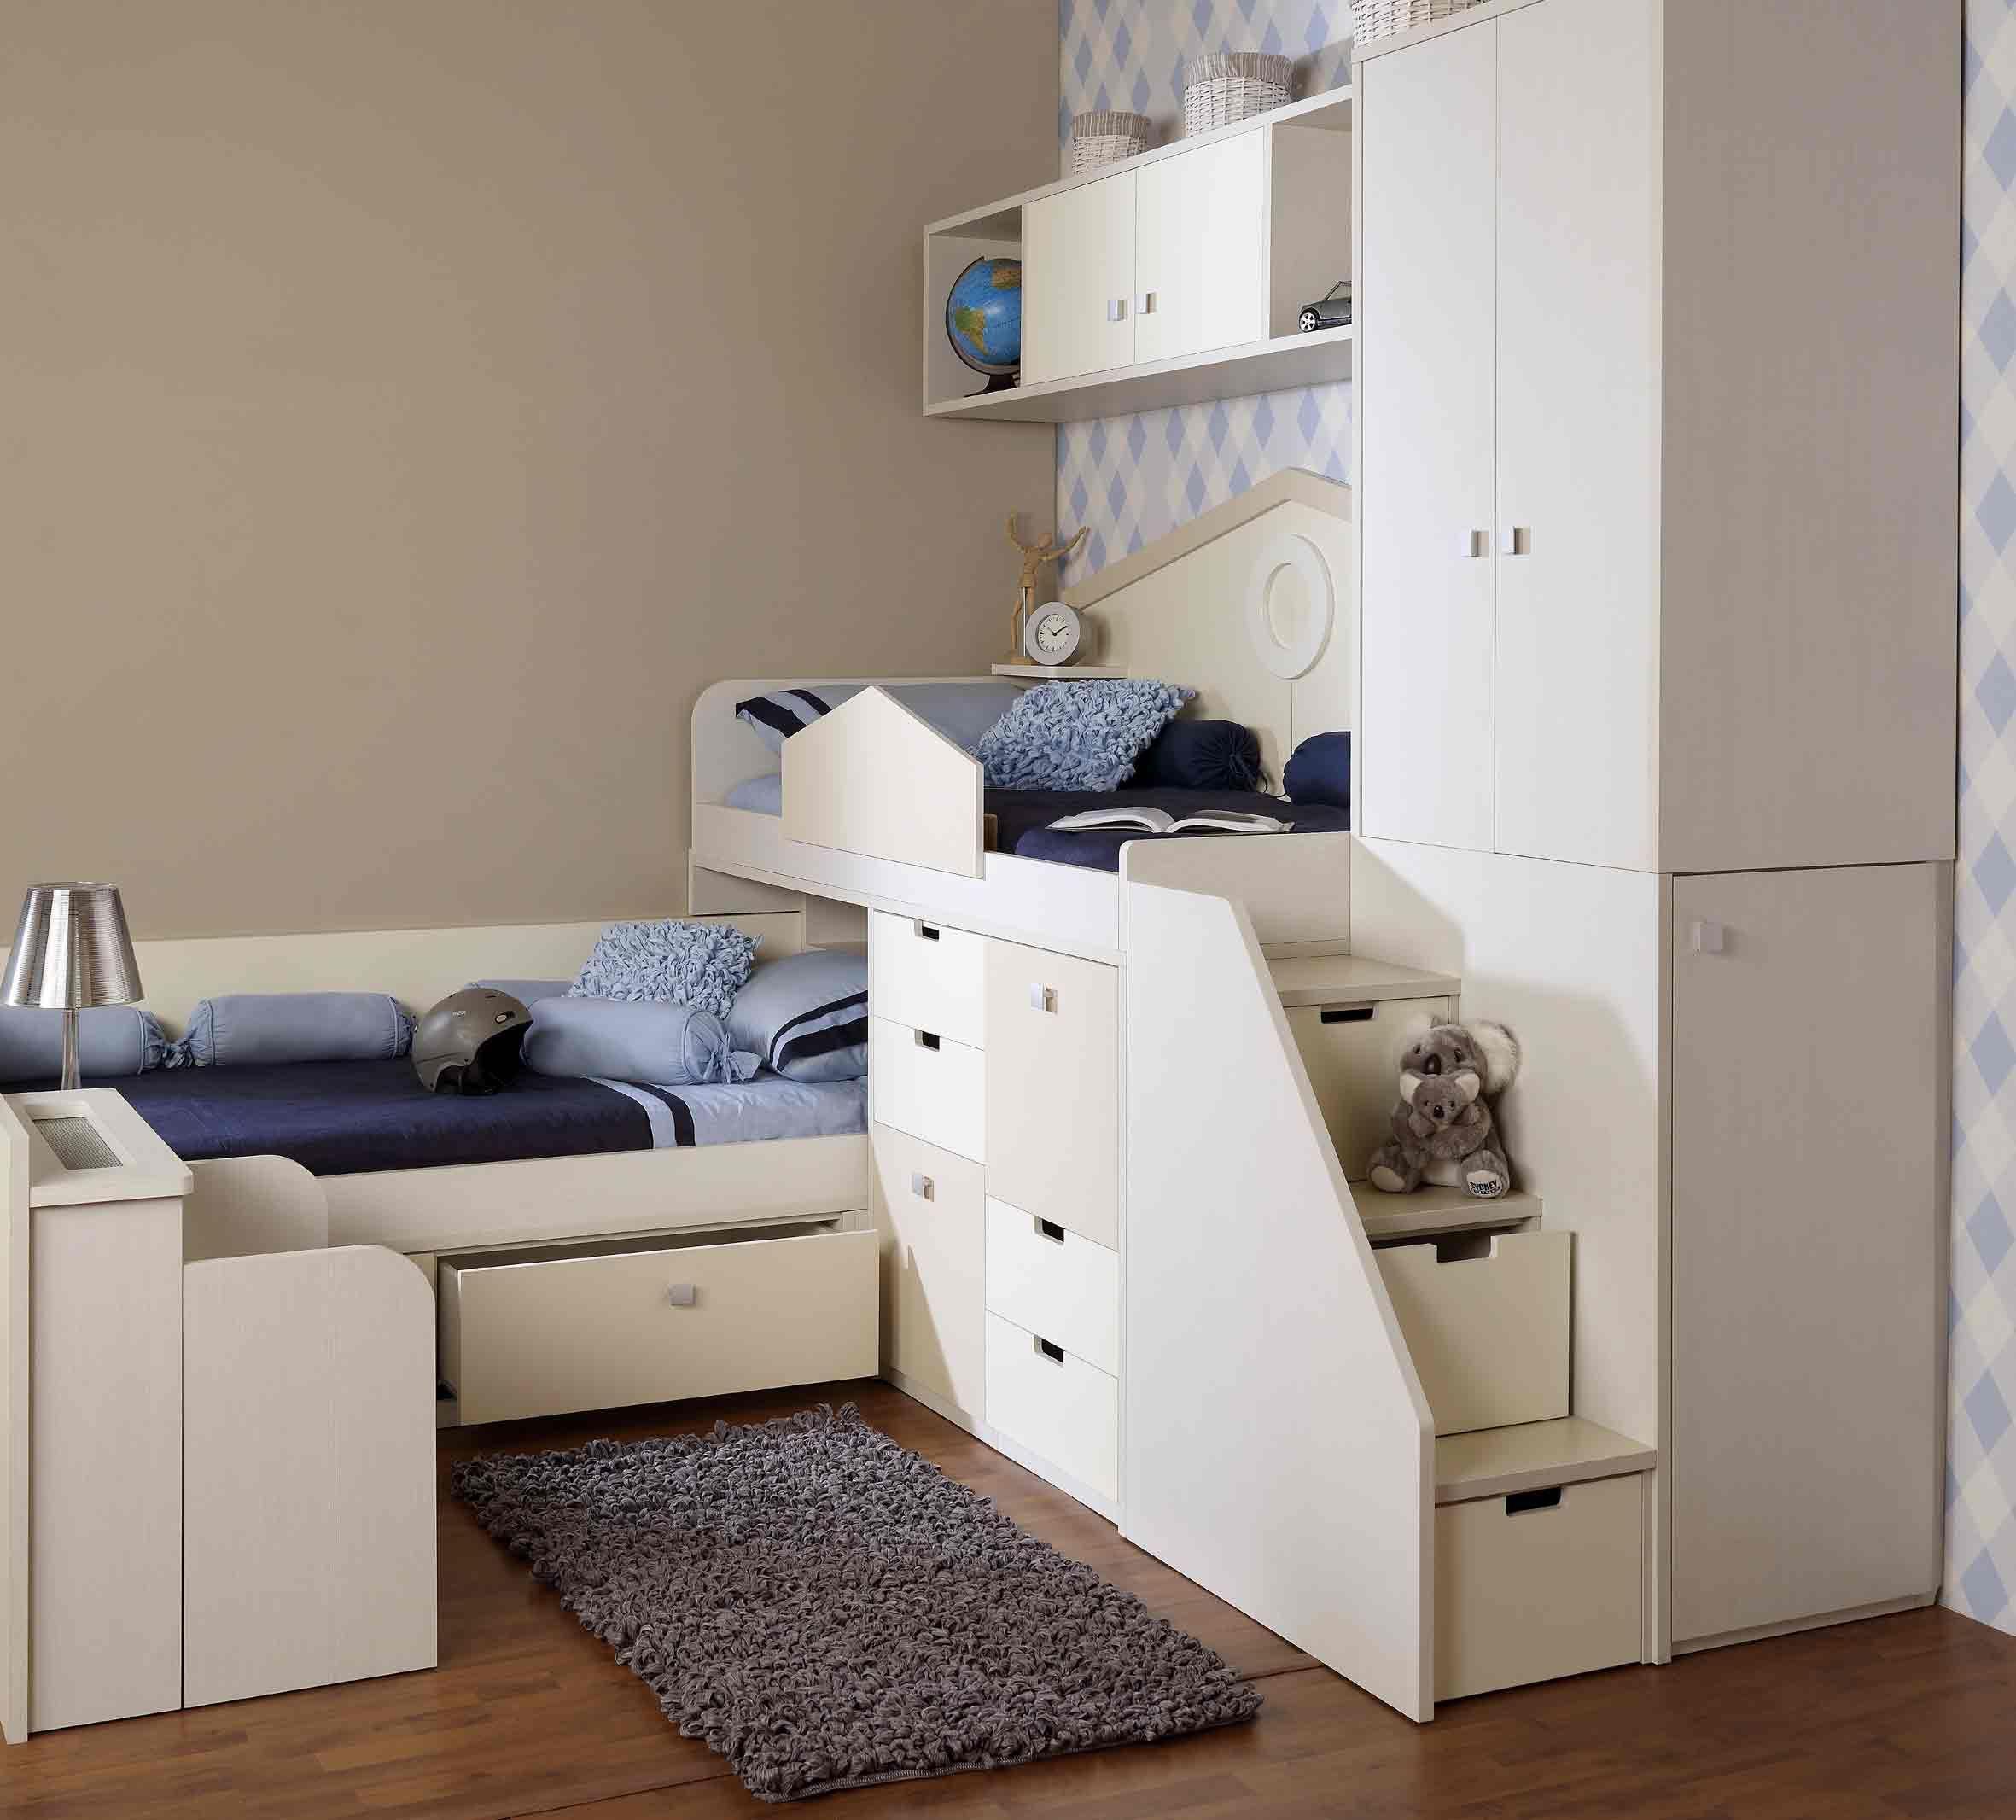 Recamara ni os 6 ni os pinterest recamaras ni as - Habitaciones juveniles muebles tuco ...